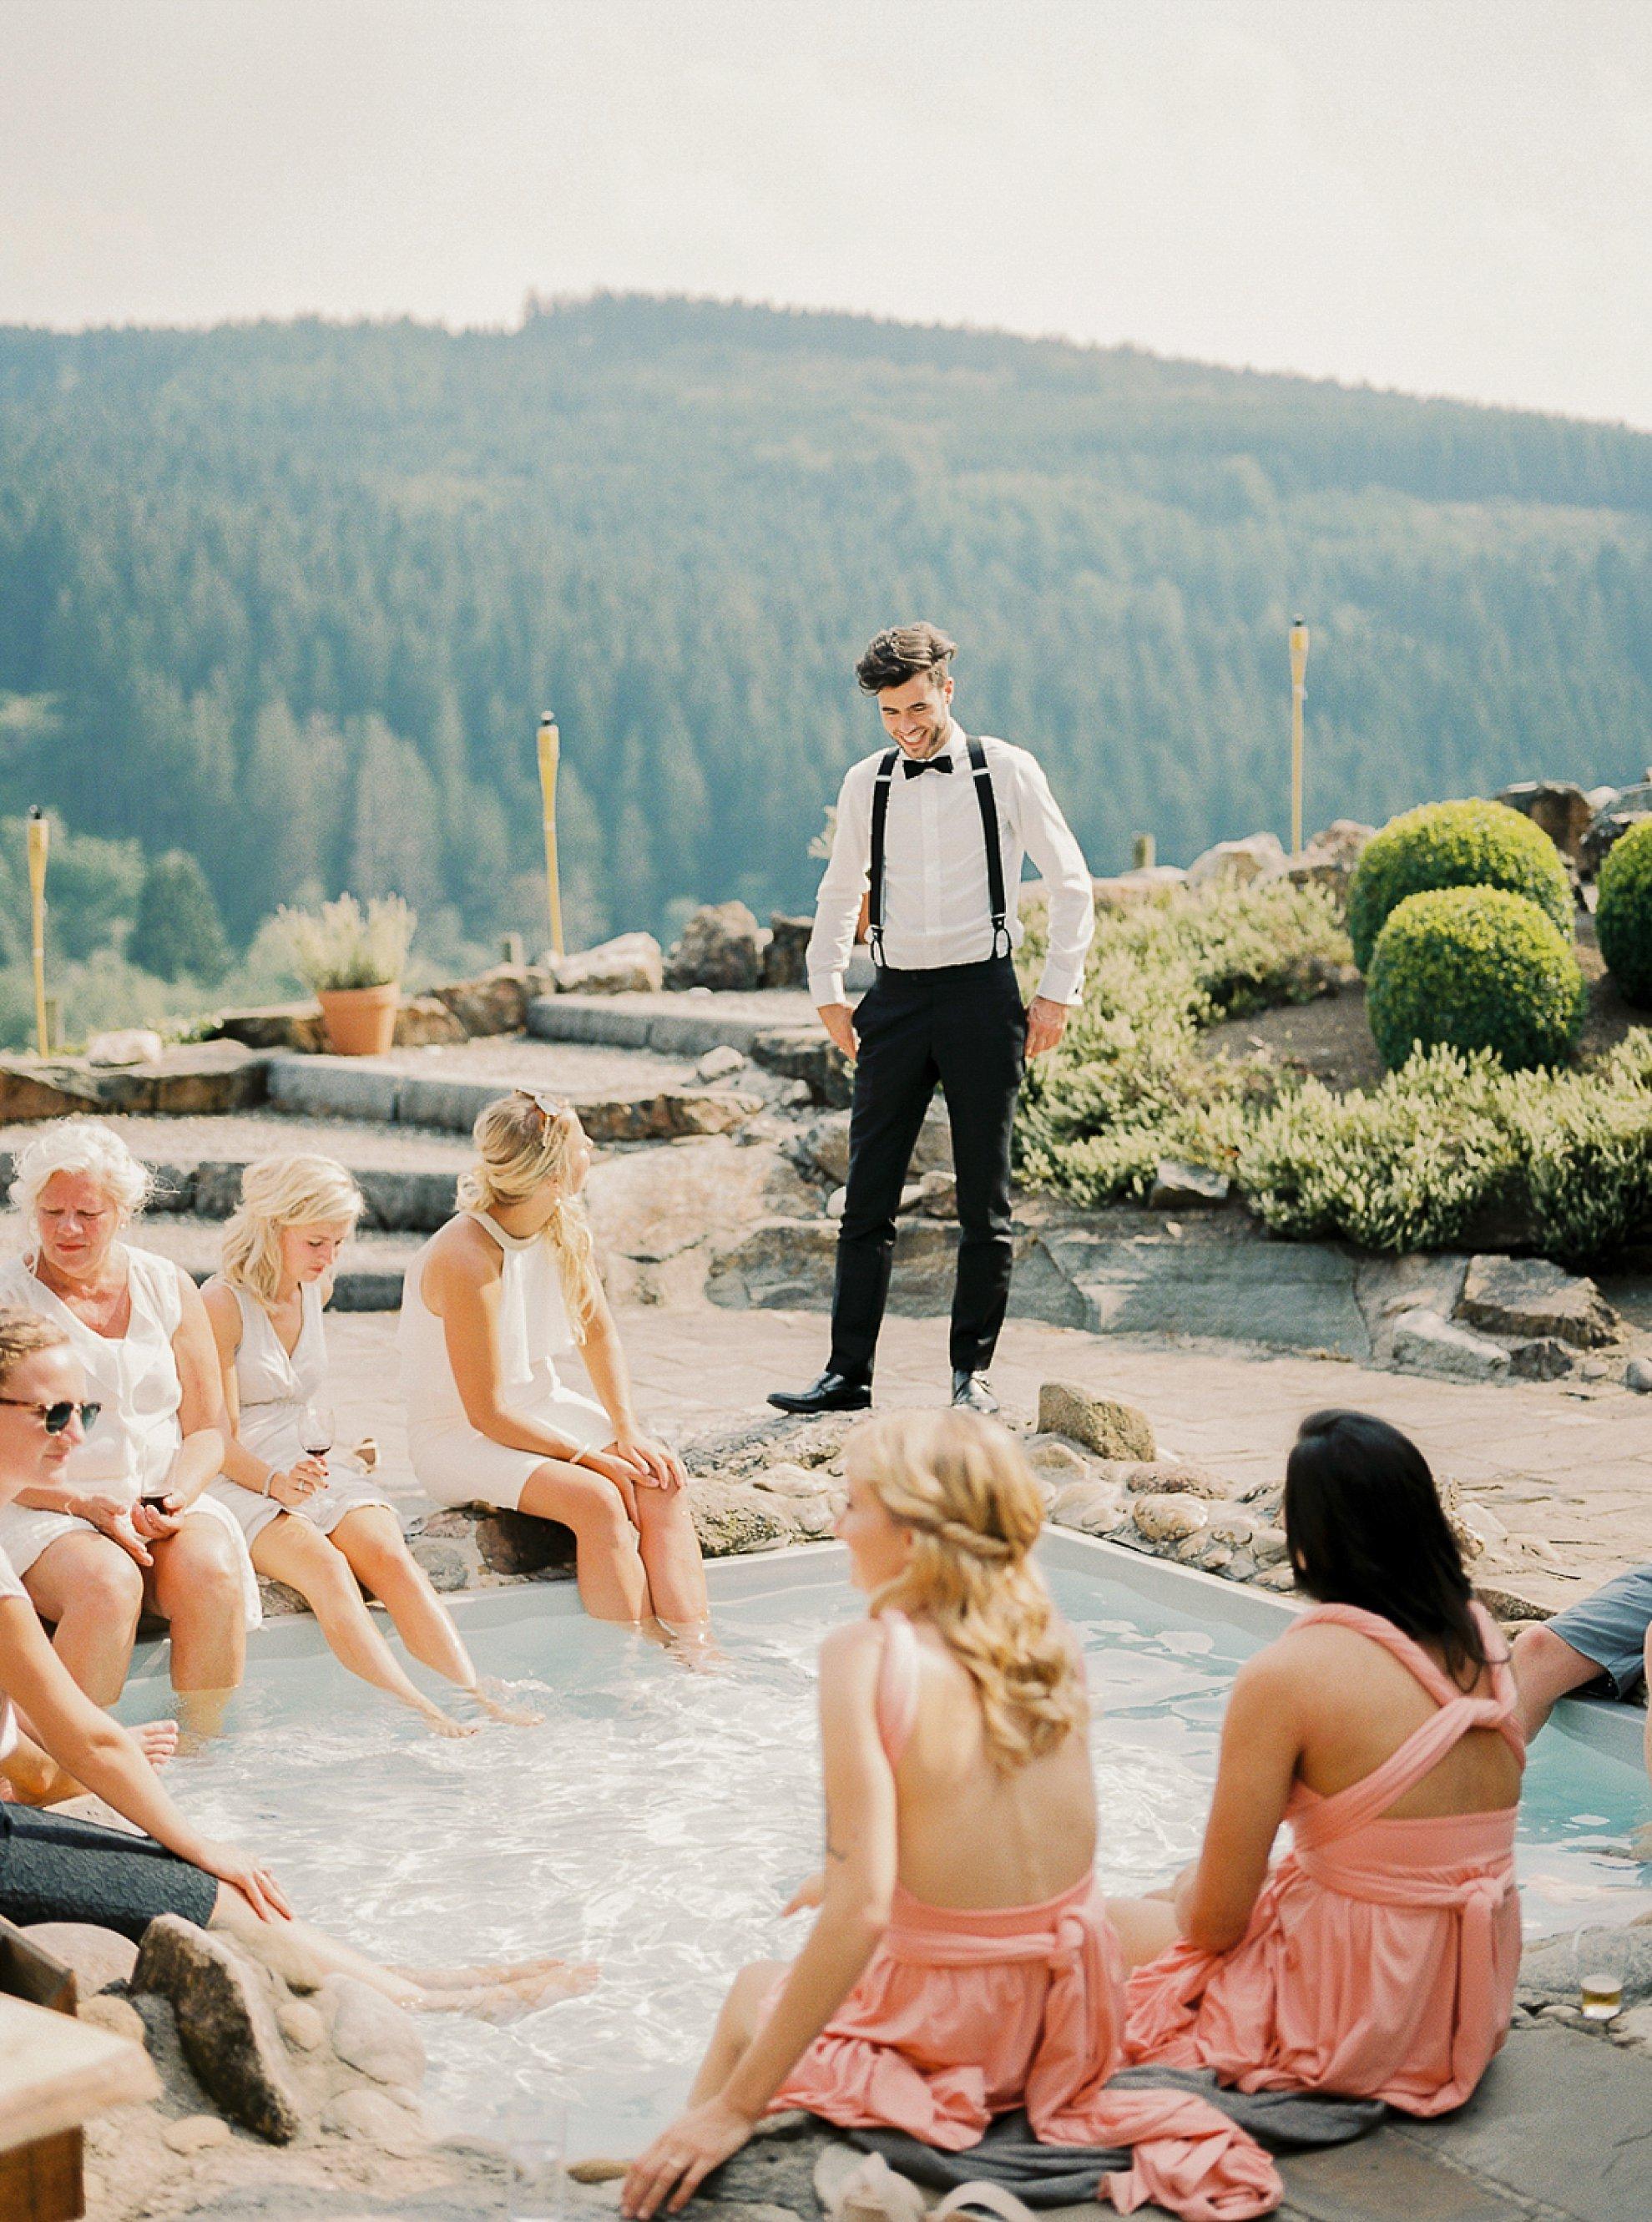 Amanda-Drost-Fotografie-Belgie-Photography-Wedding_0034.jpg